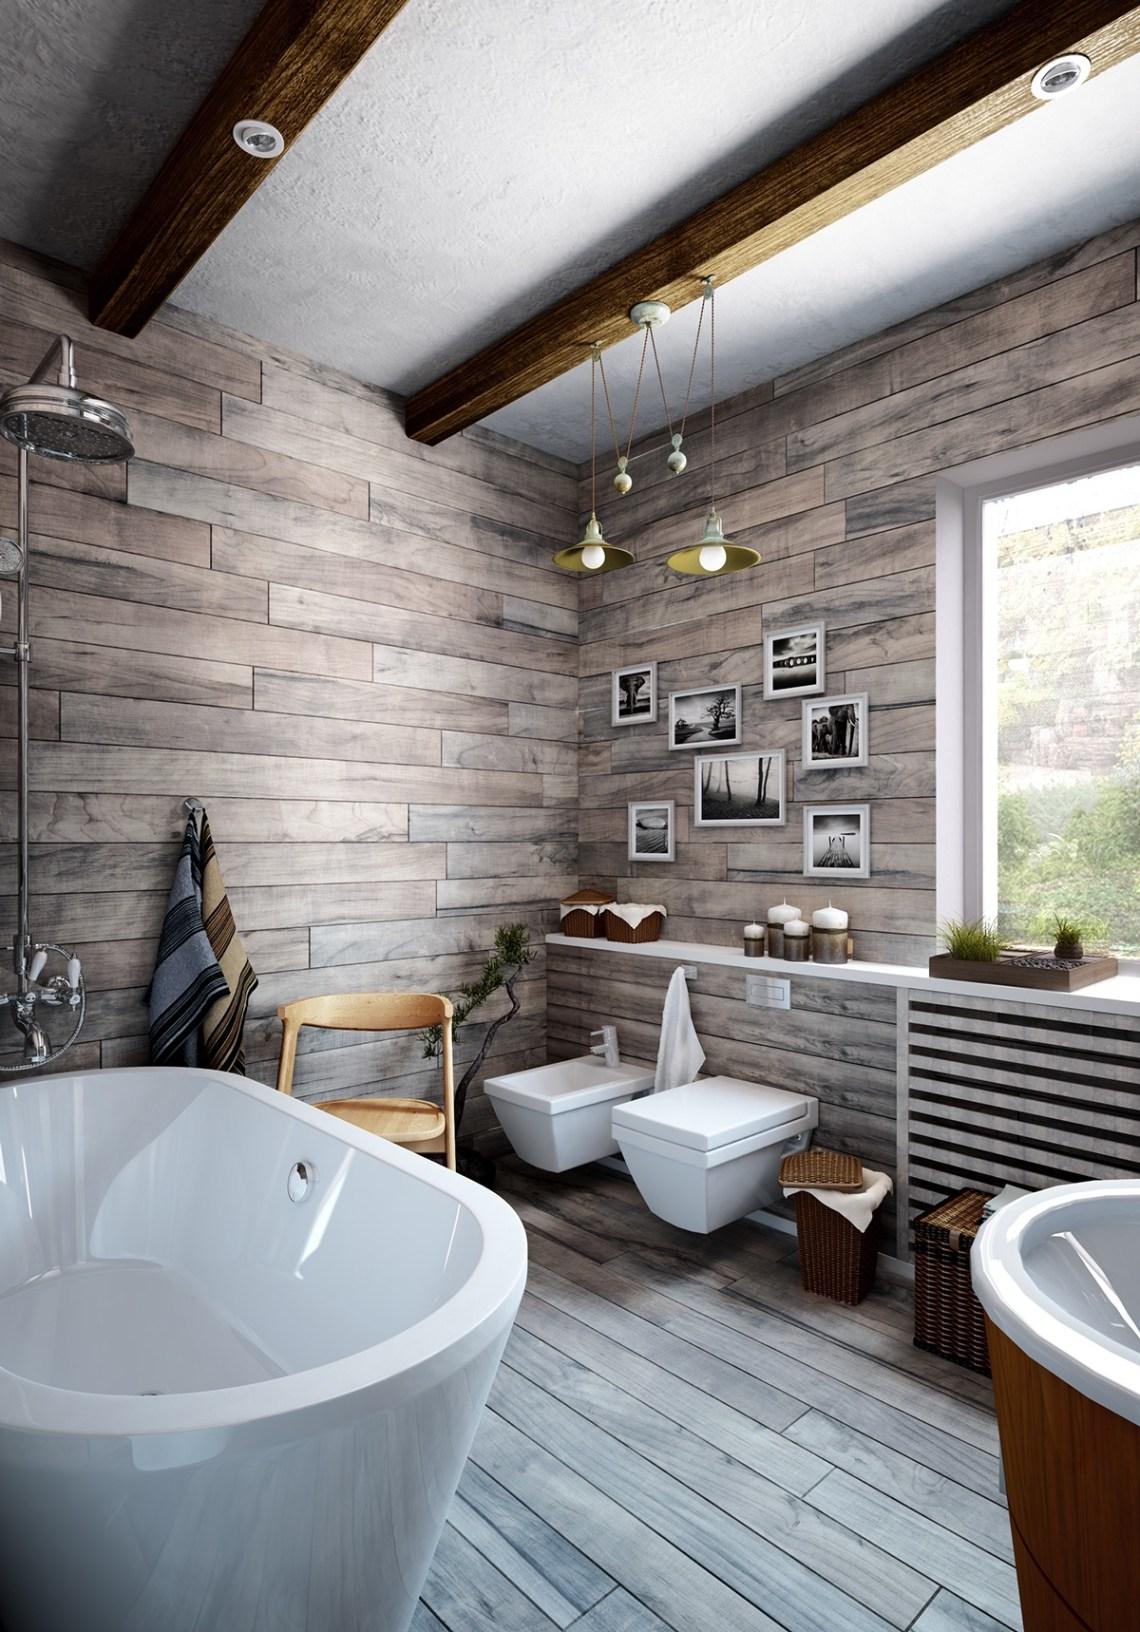 Modern Bathroom Design Ideas Using a Wooden Accent As The ...